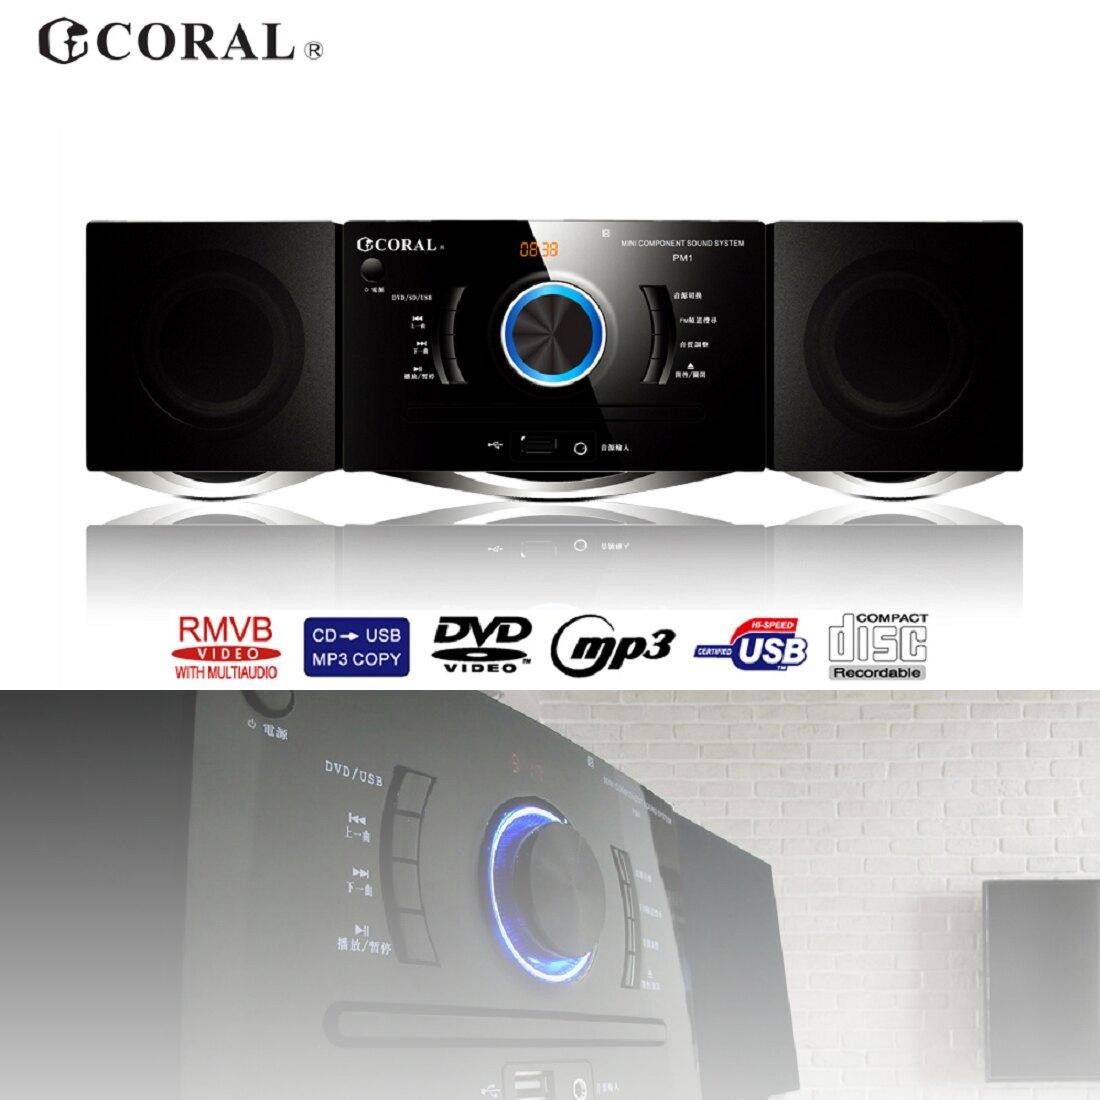 CORAL PM1 小型DVD音響 多功能媒體播放器 共振音箱 床頭音響 模擬劇場影音爆發力 FM收音機 家庭劇院